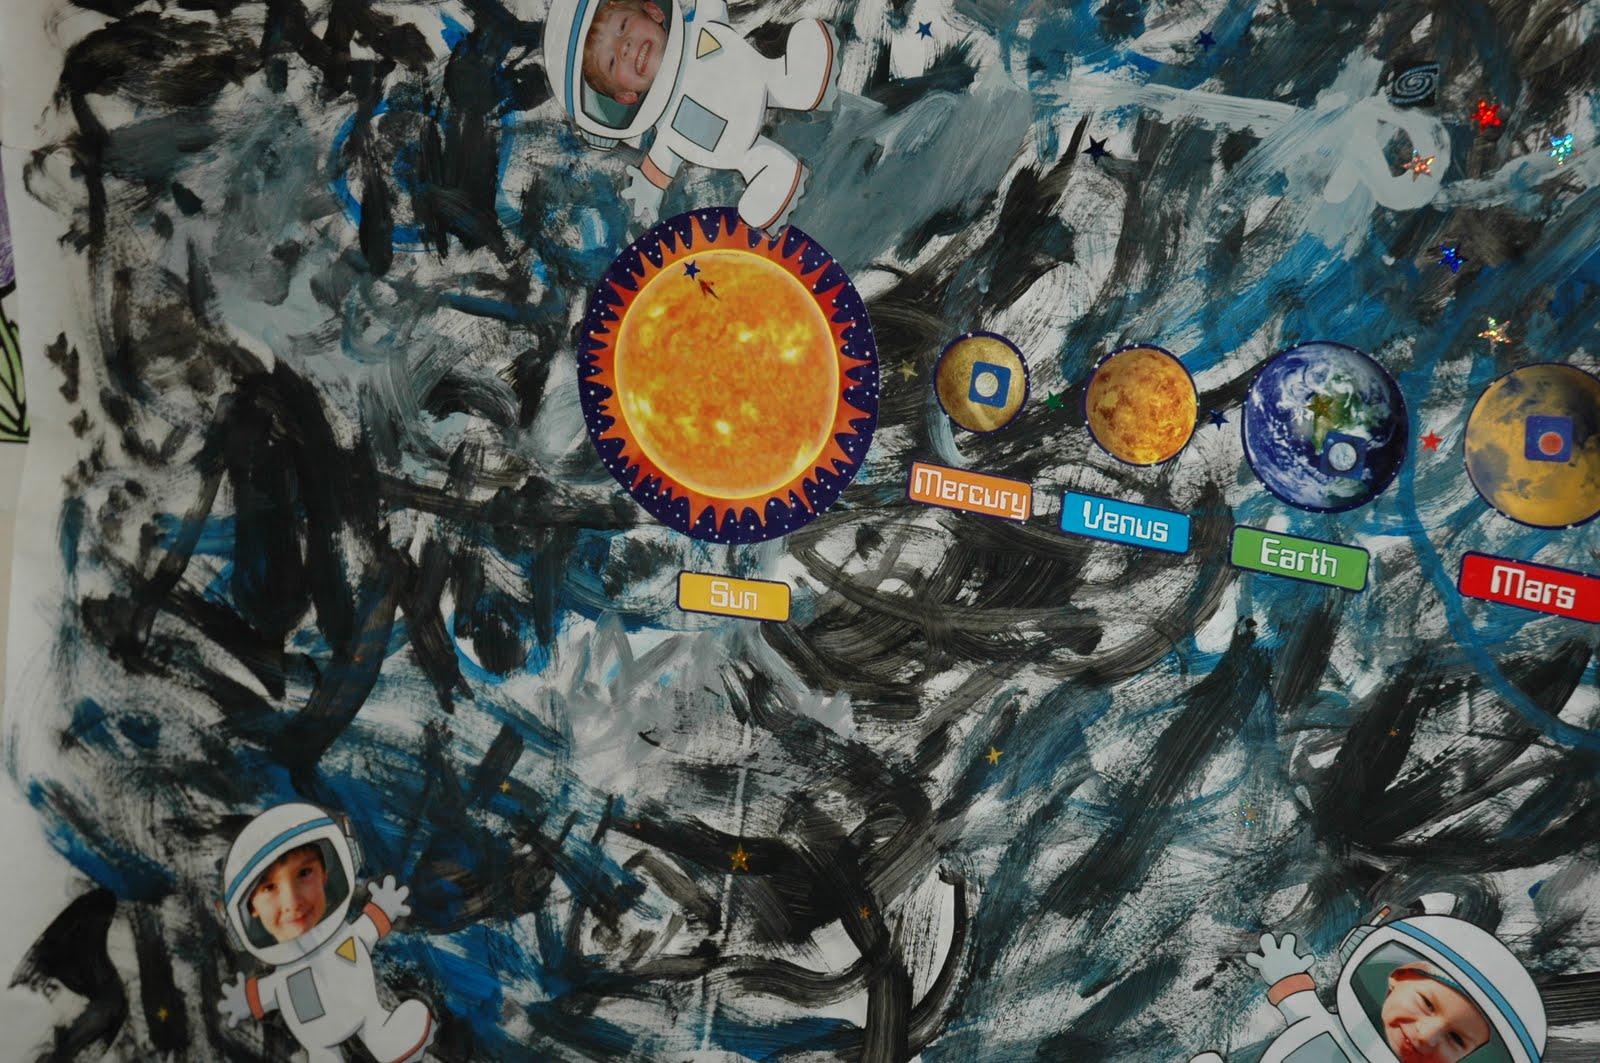 astronaut mural - photo #33